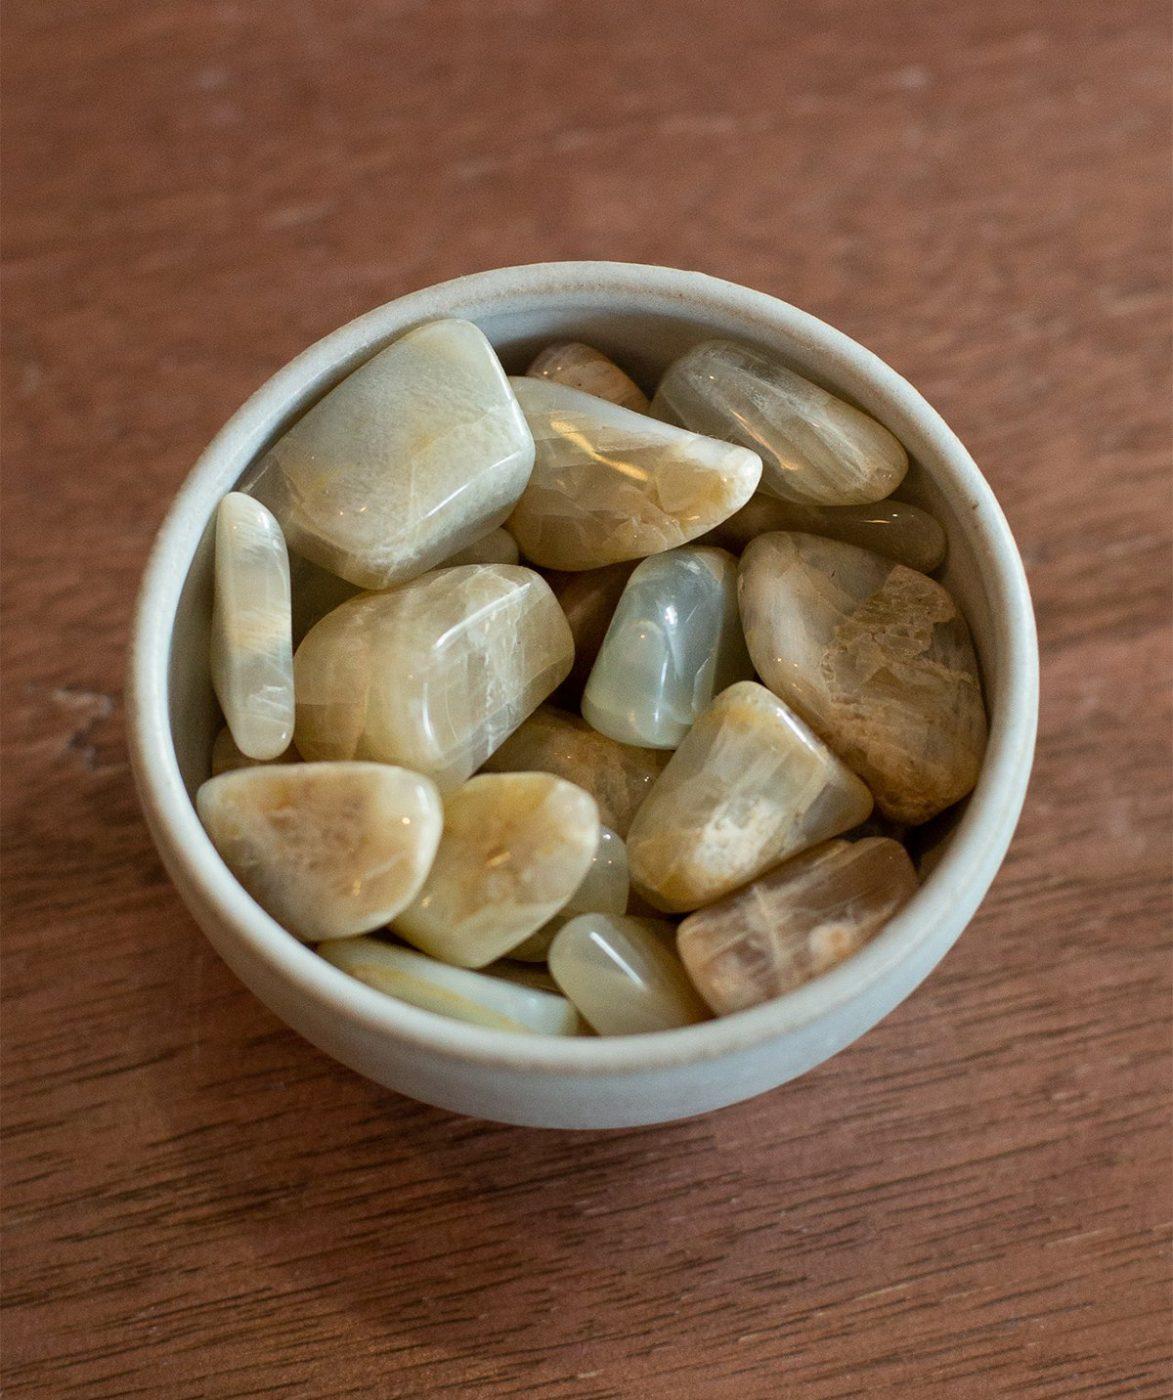 Tumbled moonstone stones